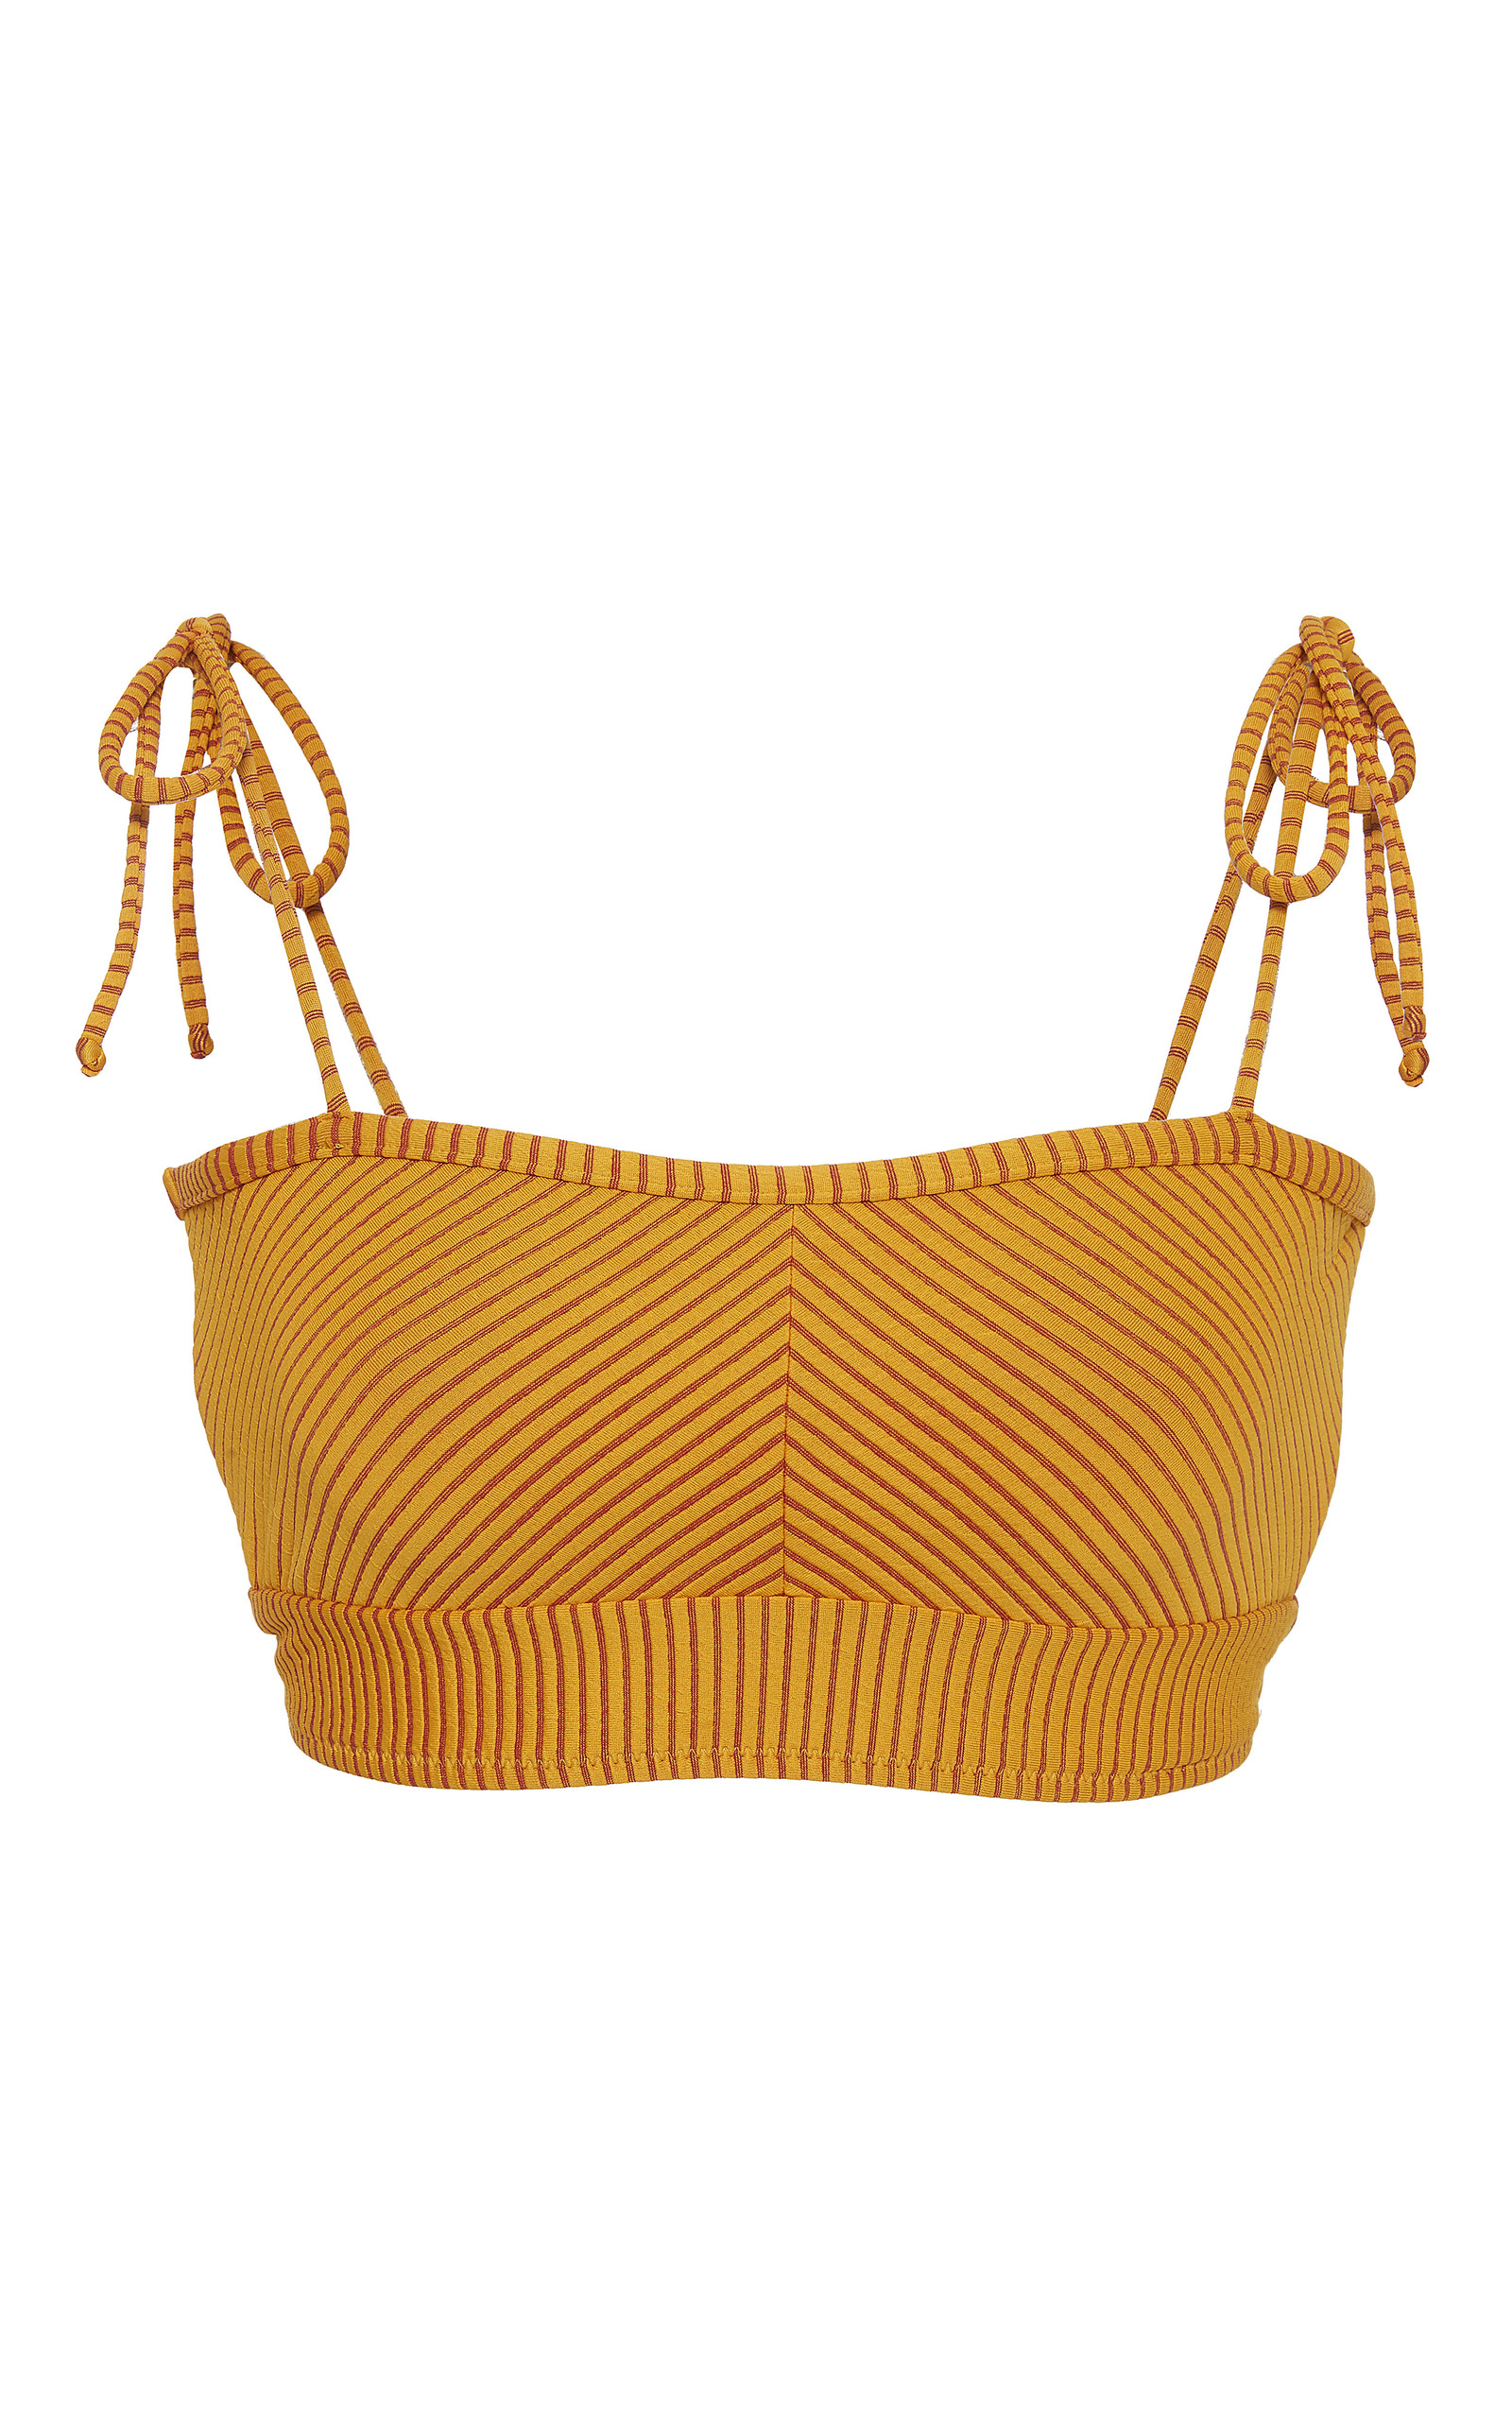 Factory Price Discount Footlocker Zuma Ruffled Halterneck Bikini Top - White Marysia Swim Outlet ar4AZnV